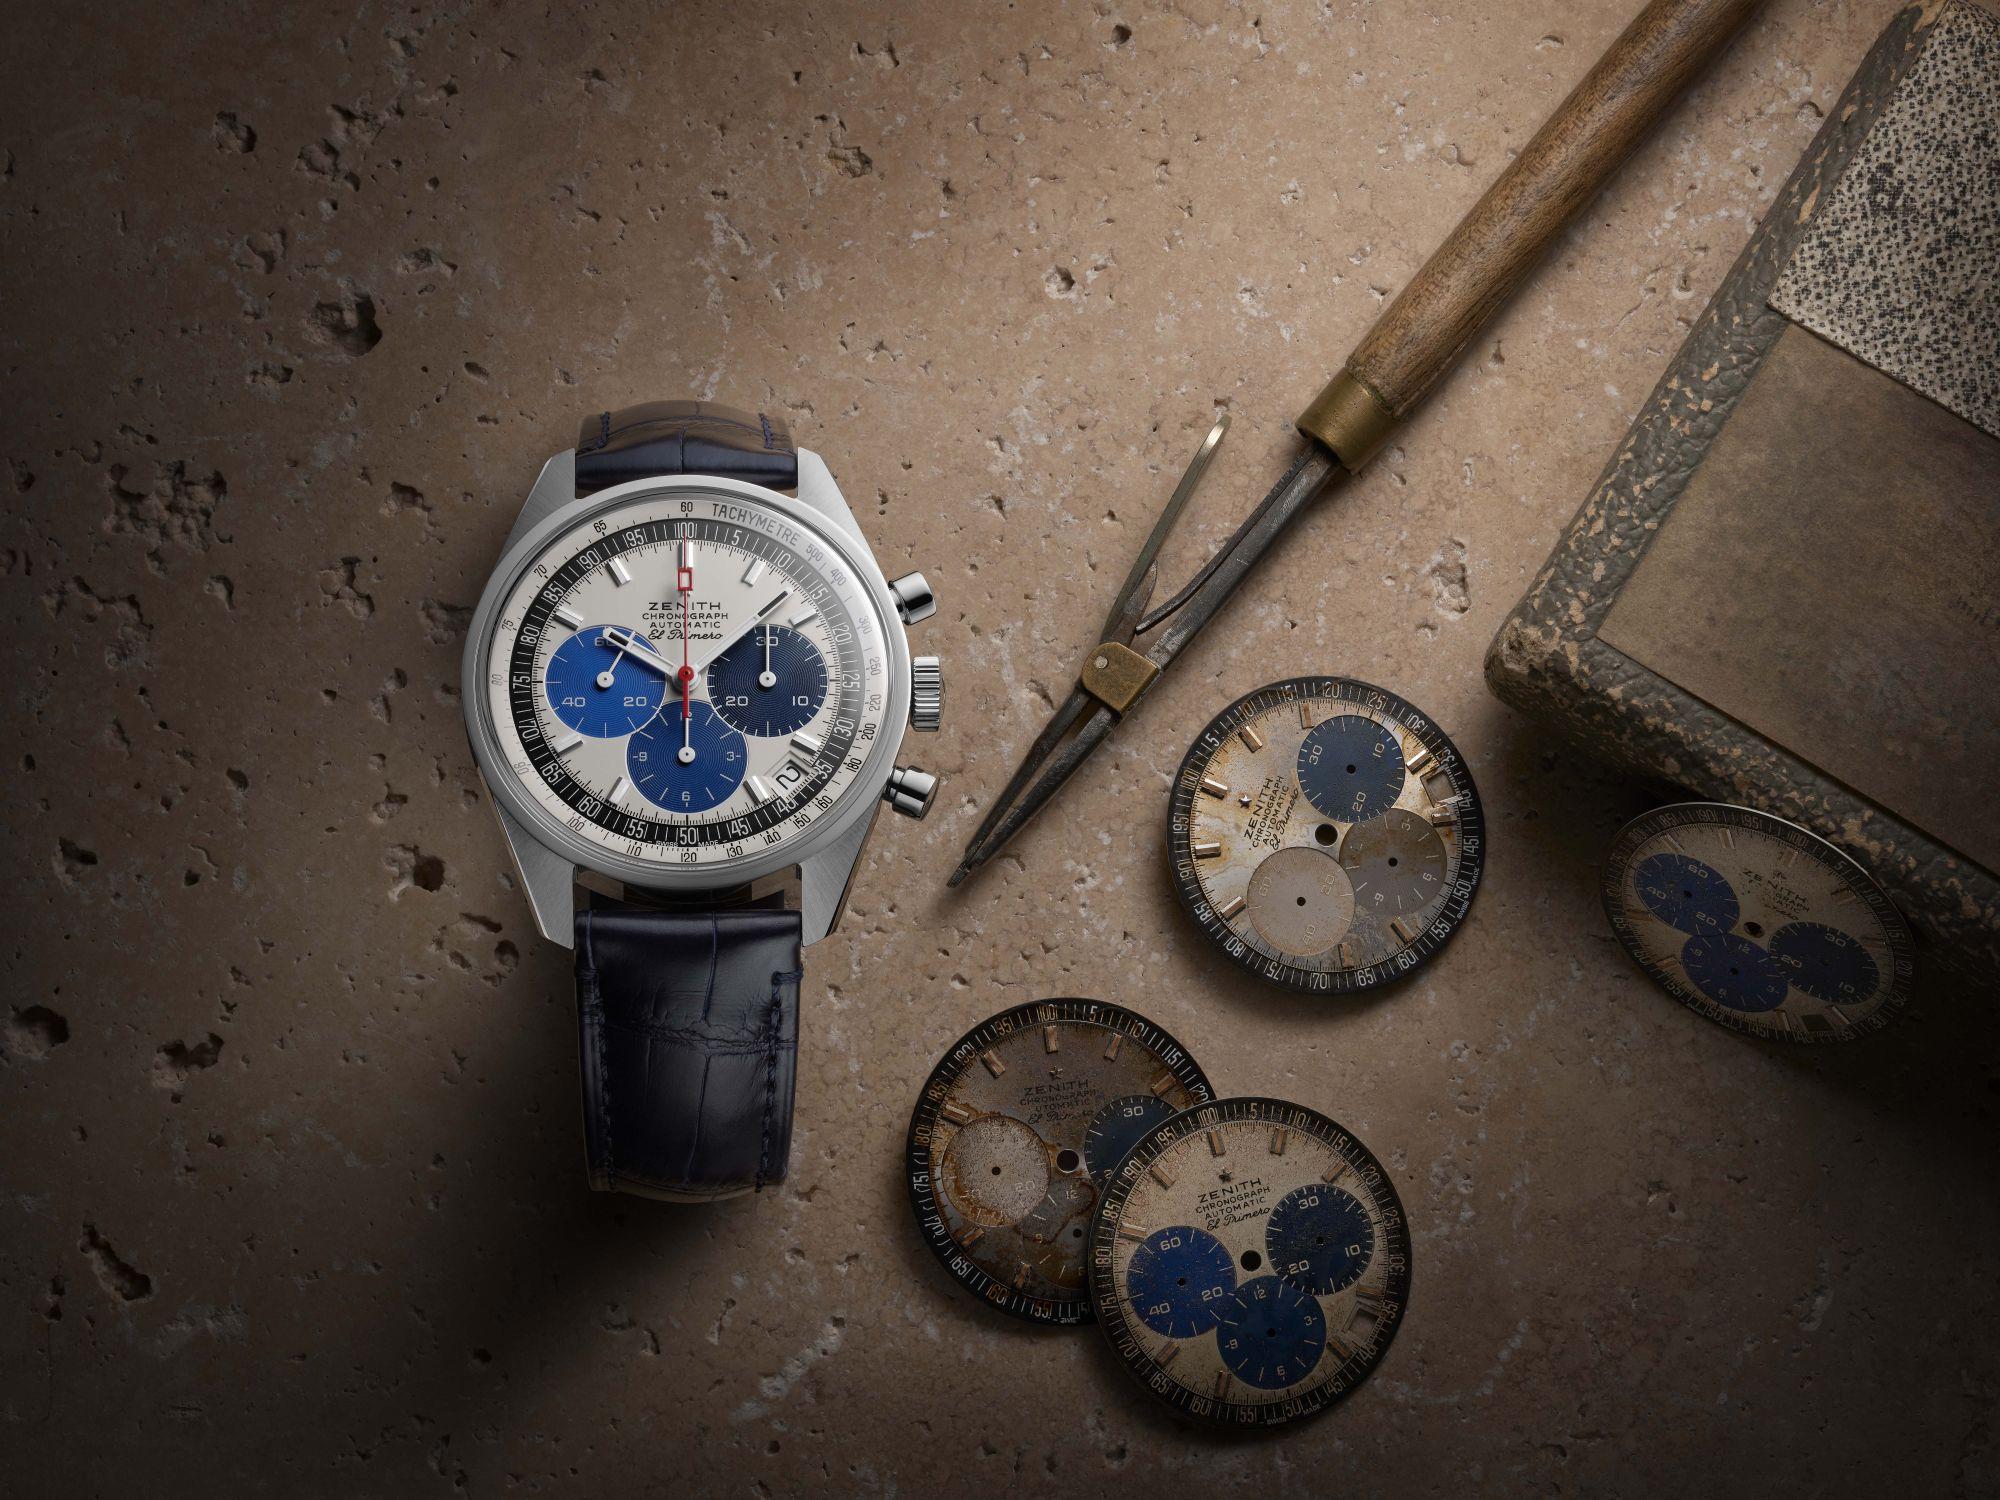 Chronomaster系列復刻版腕錶,有著與1969年發售的El Primero A386腕錶相同的DNA by Zenith。